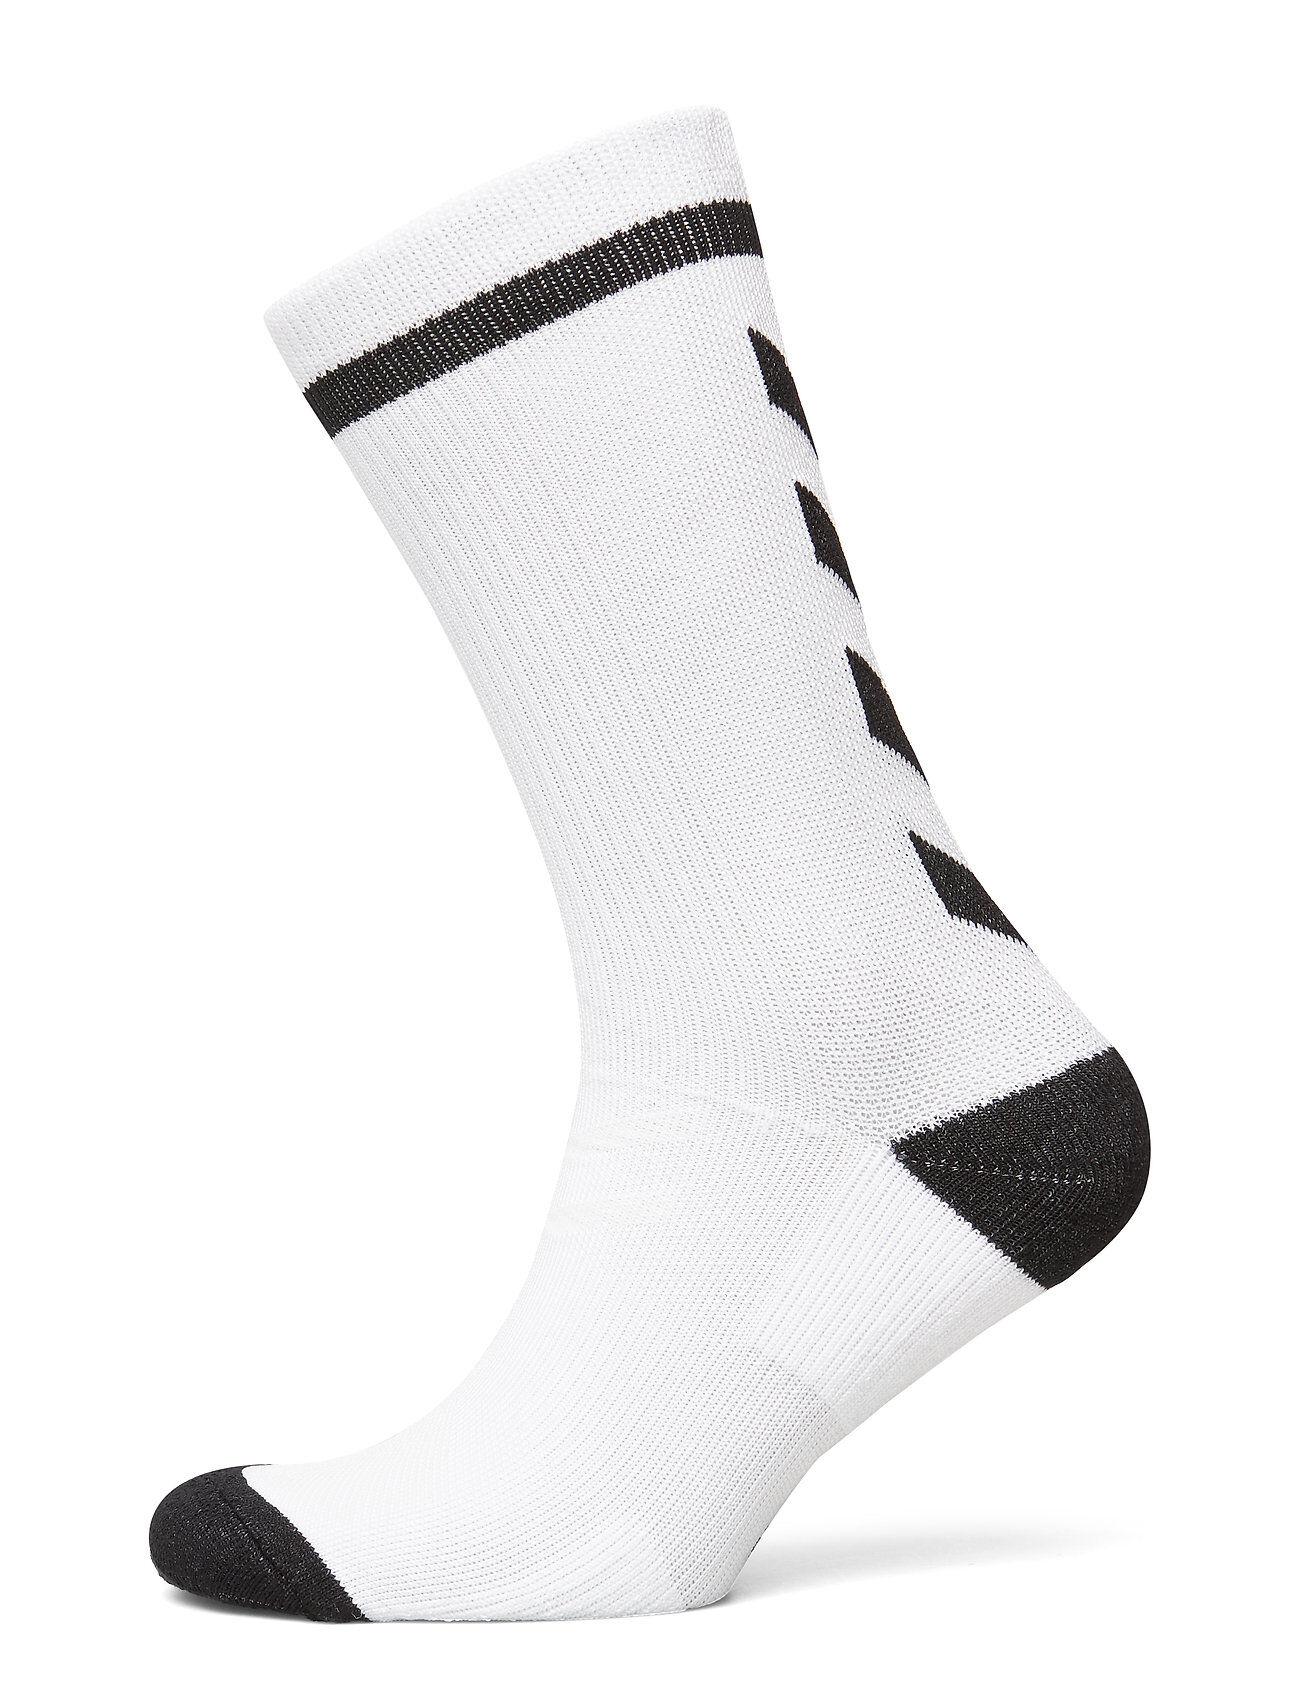 Hummel Elite Indoor Sock Low Underwear Socks Football Socks Hvit Hummel